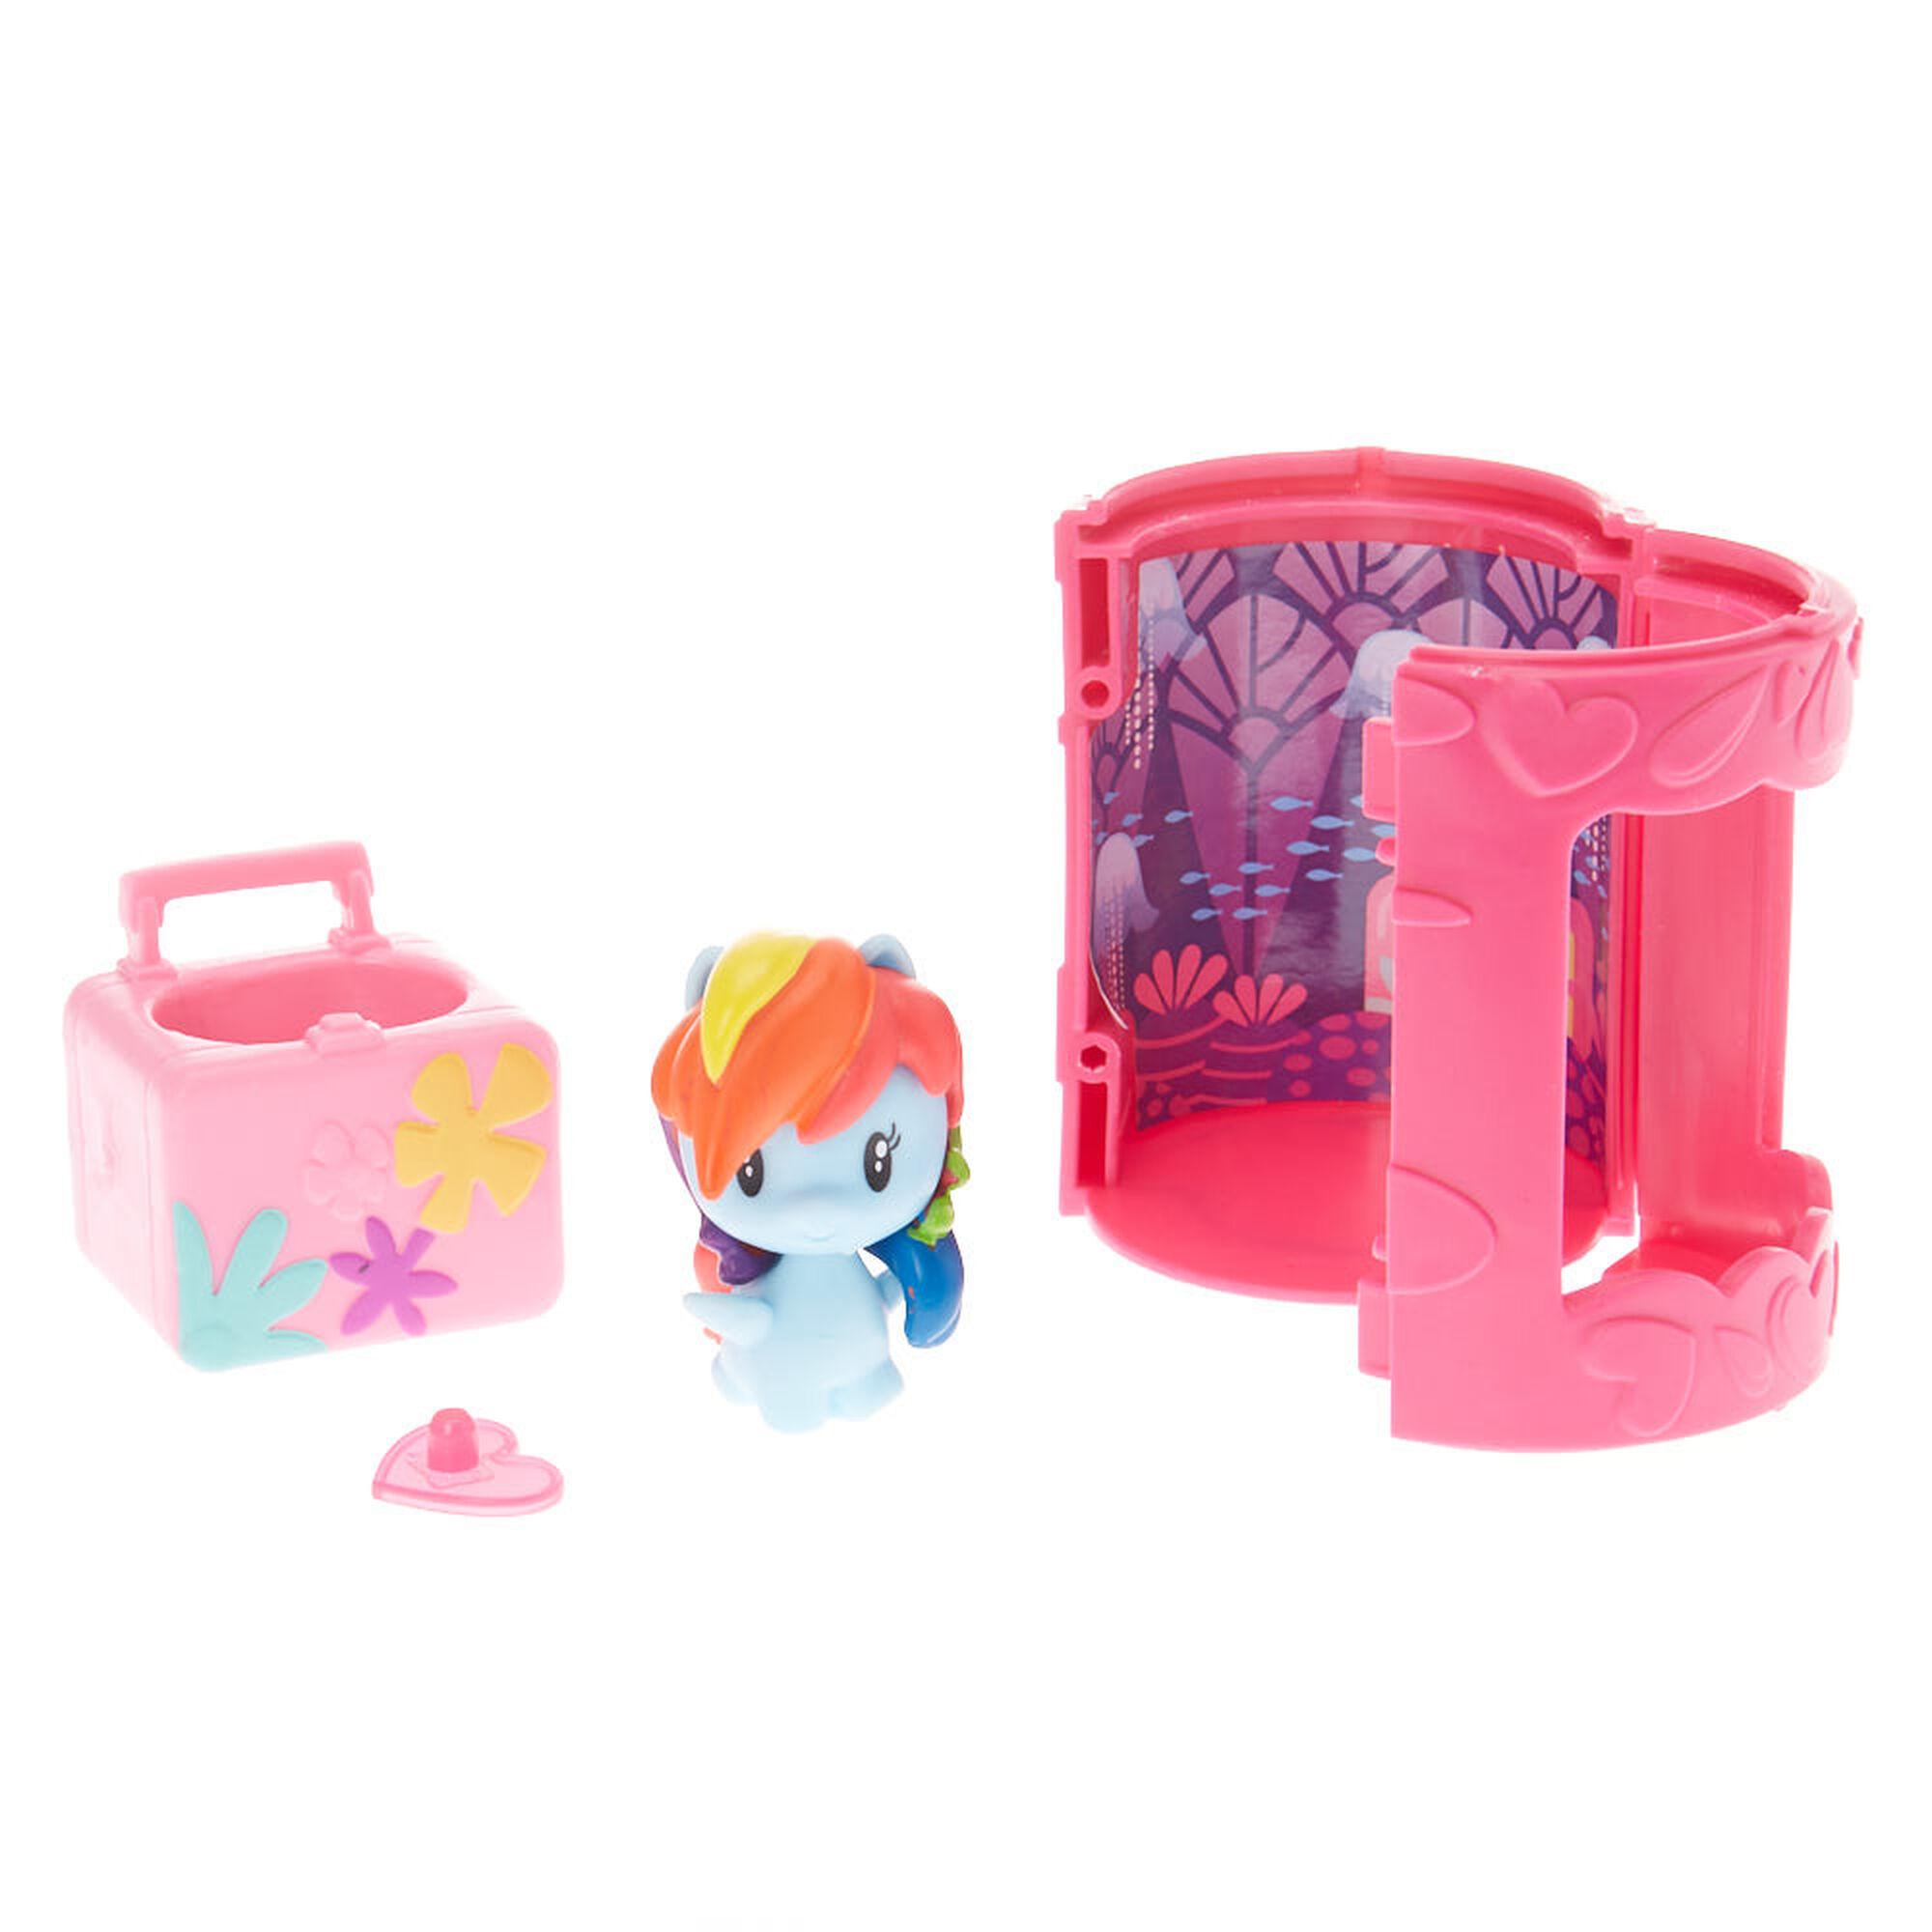 My Little Pony Cutie Mark Crew Surprise Pack